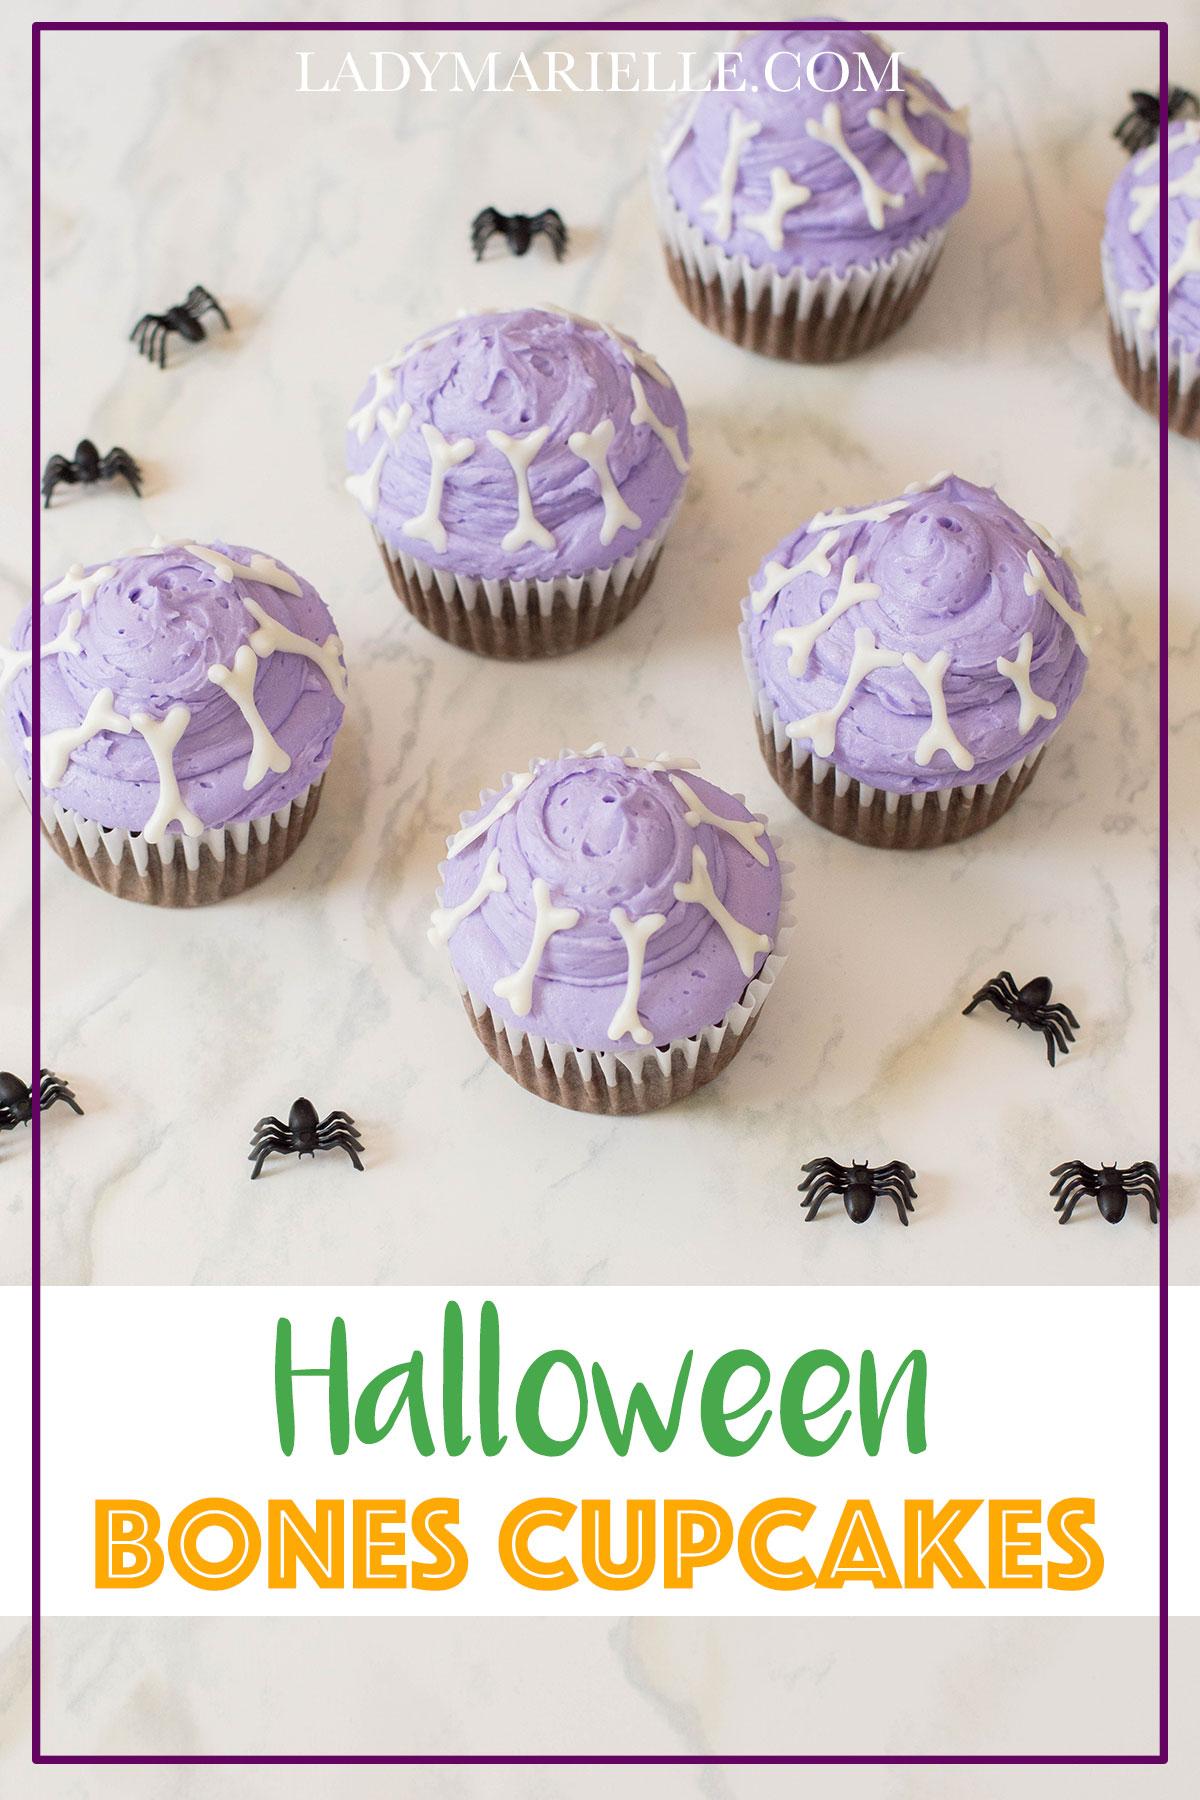 DIY Halloween Bones Cupcakes